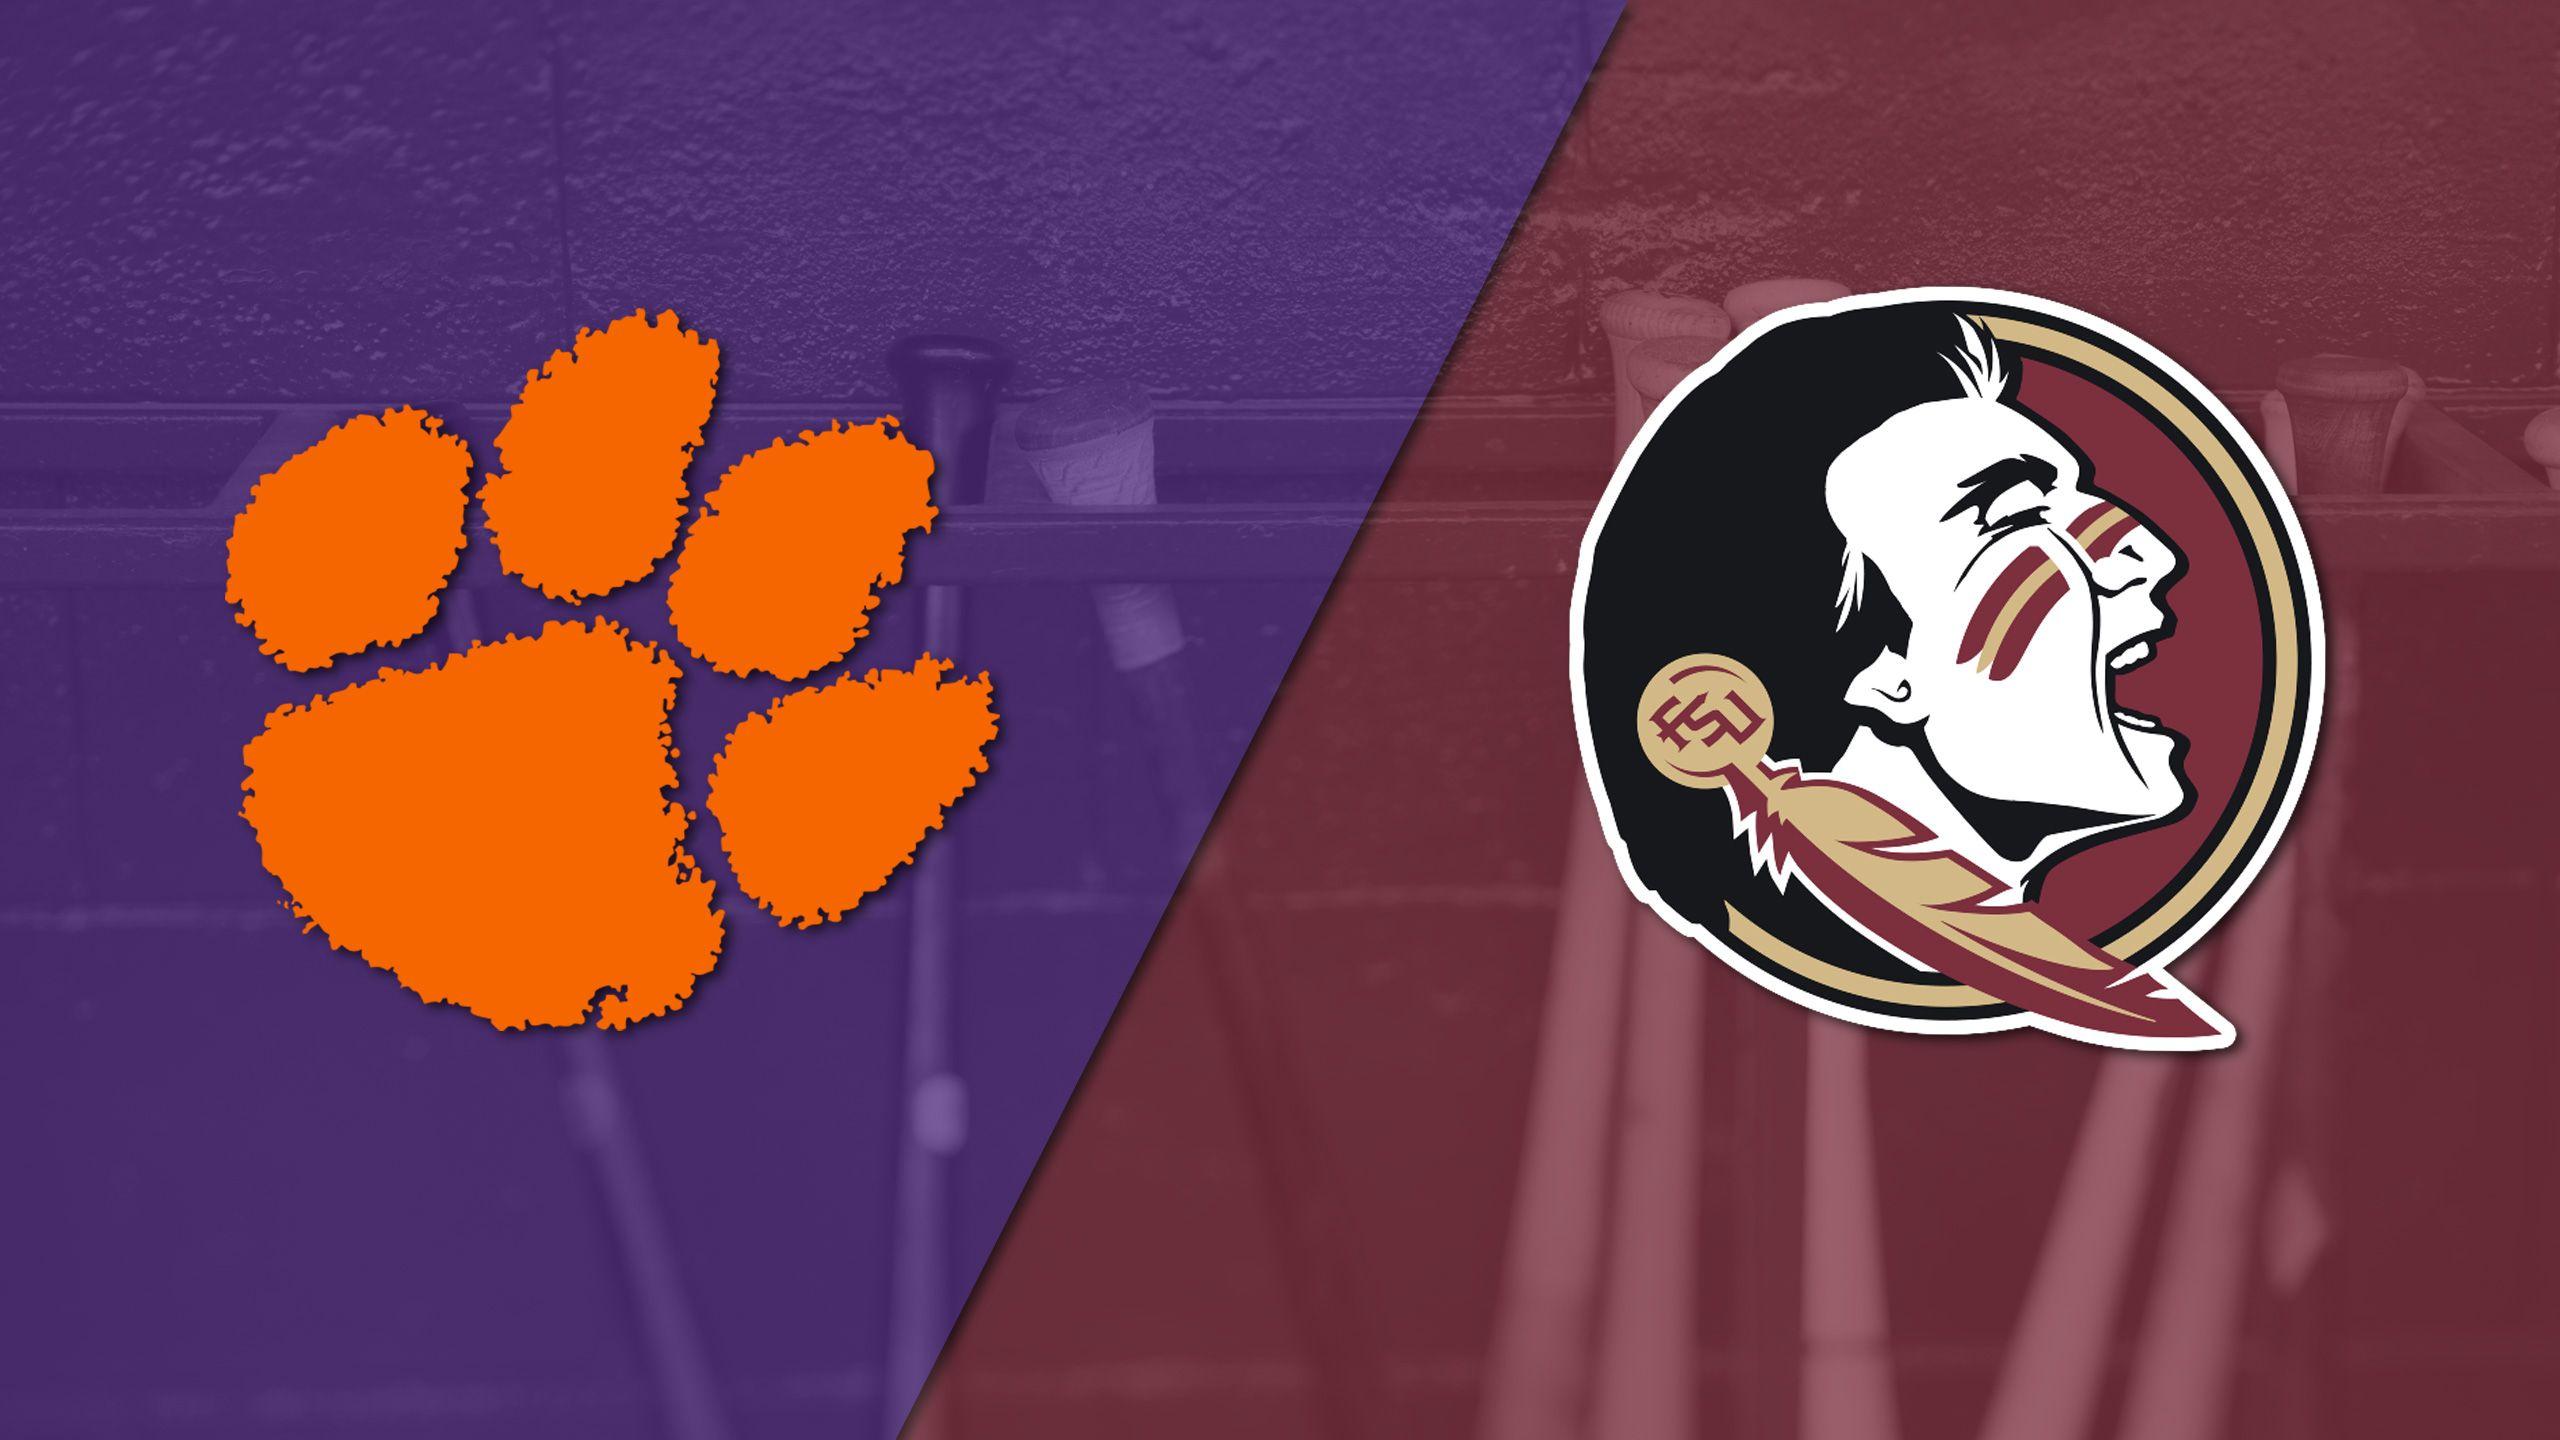 #4 Clemson vs. #25 Florida State (Baseball)